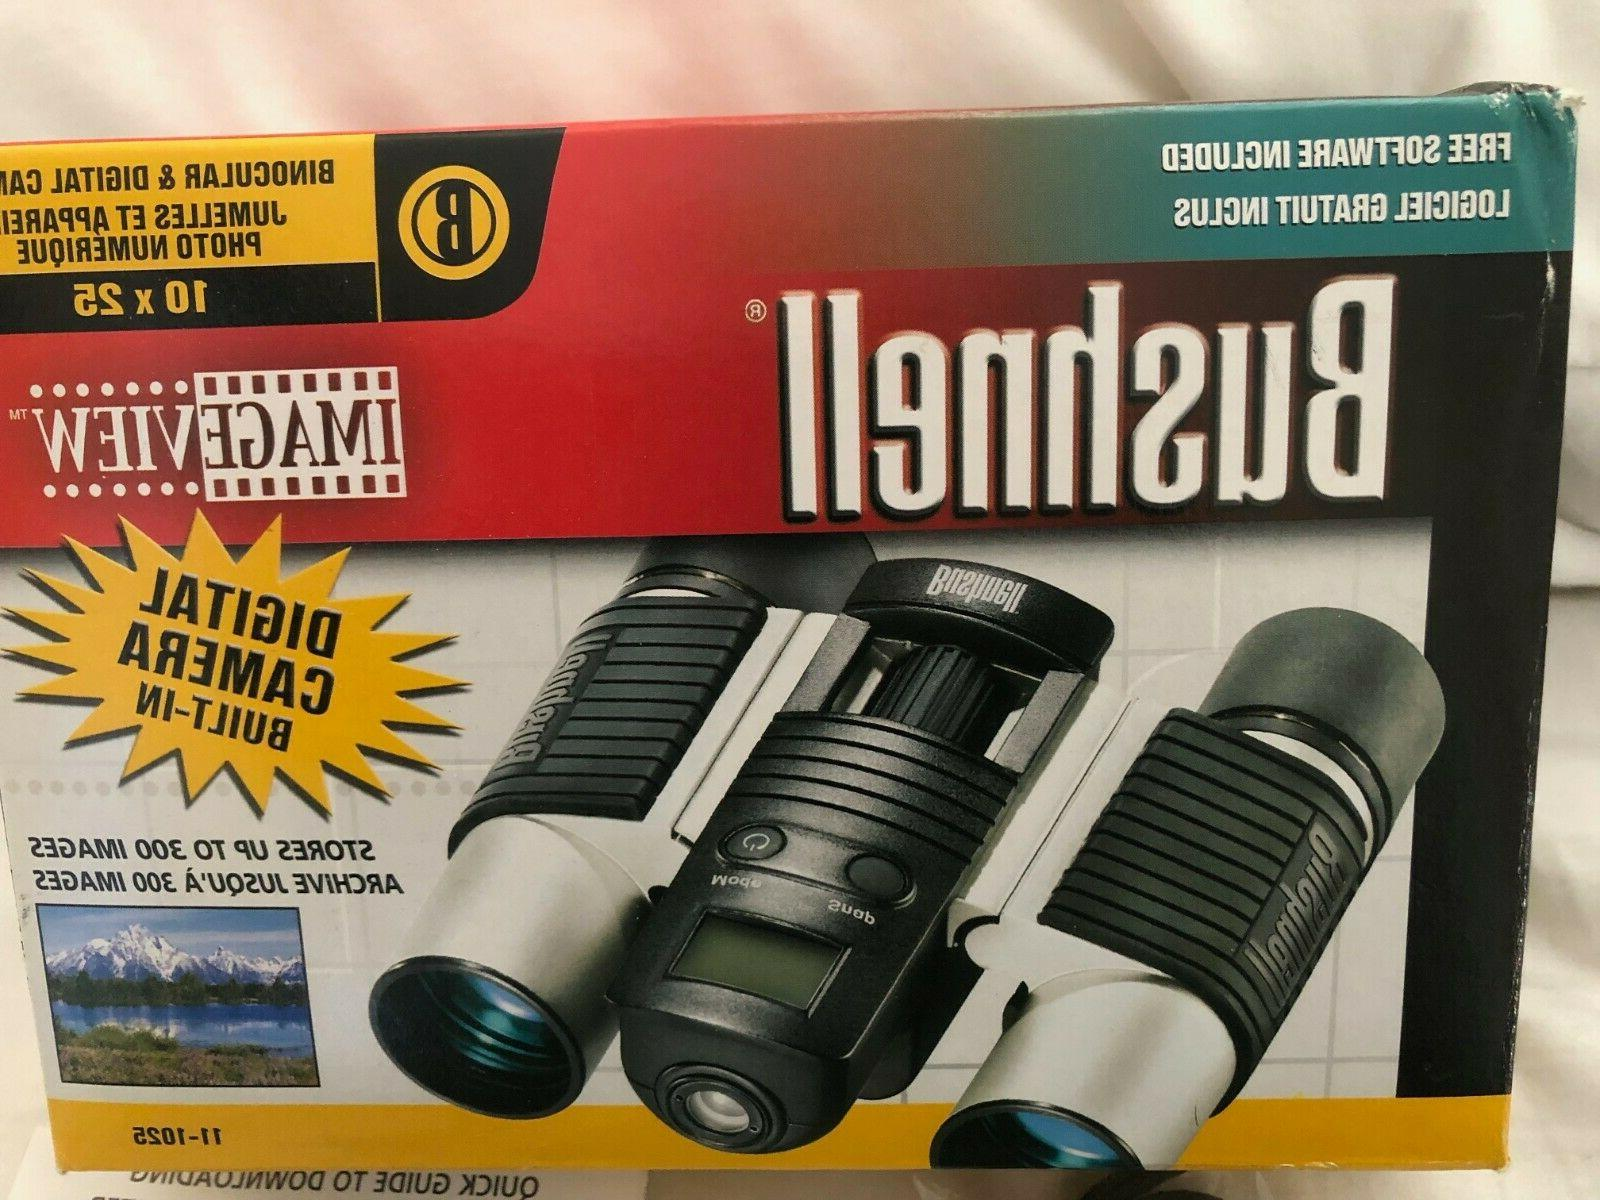 imageview binocular and digital camera 10 x